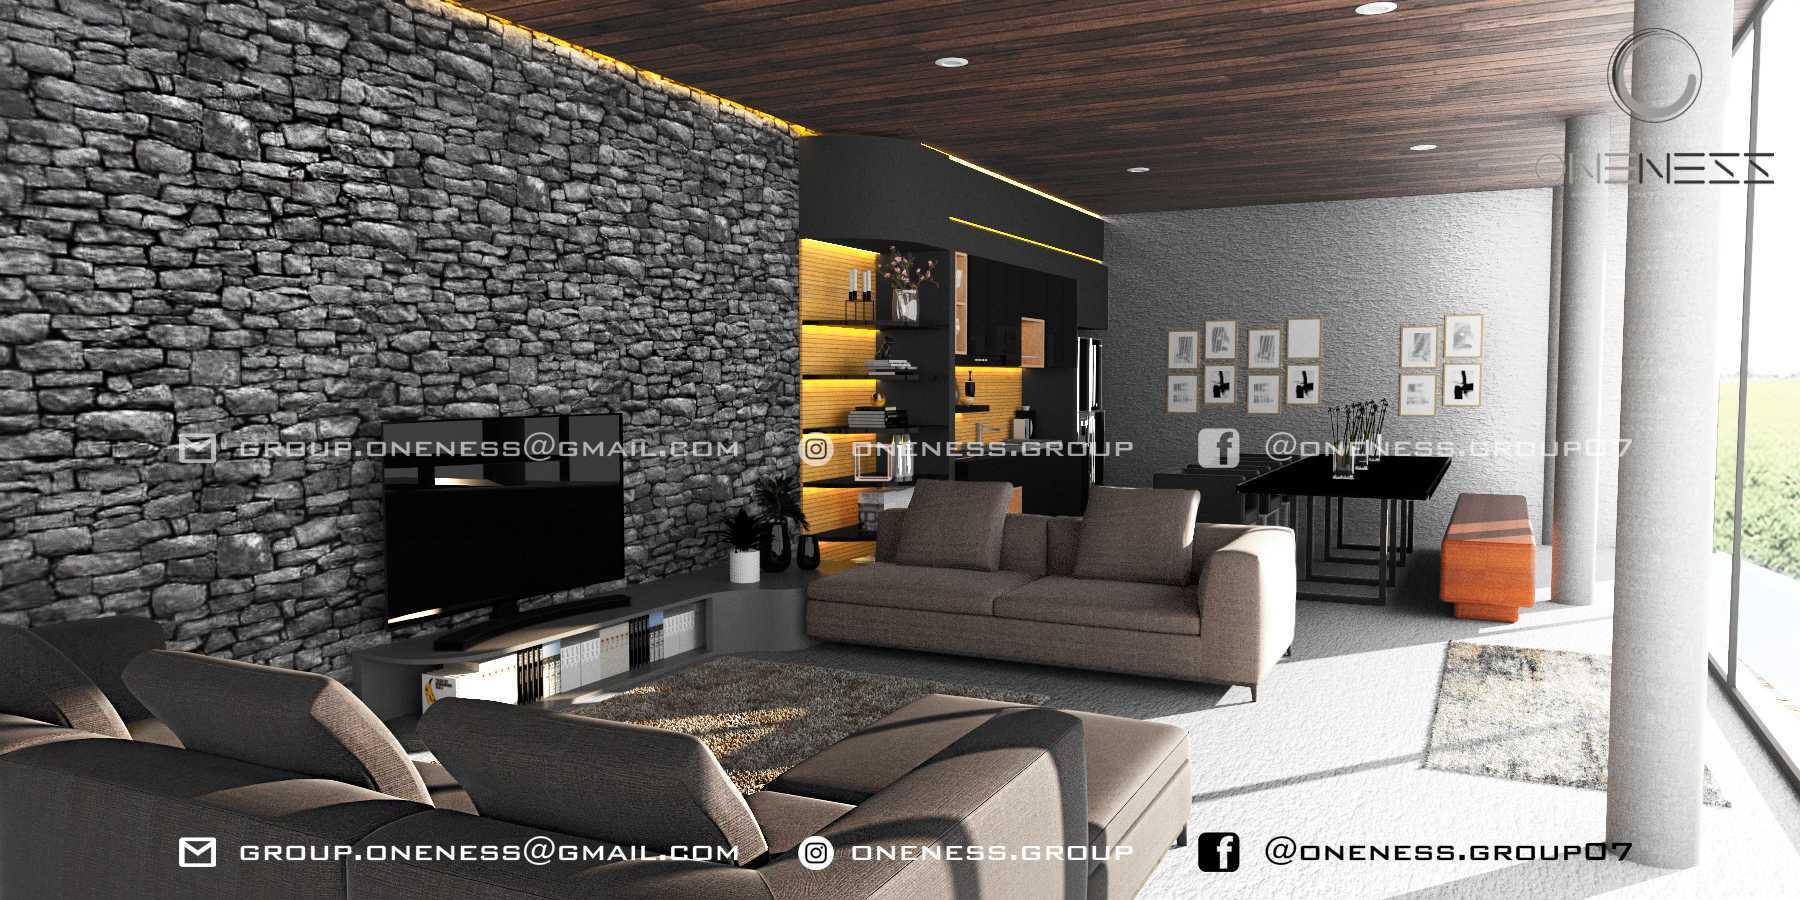 Oneness Group Villa Di Gunung Cirebon Cirebon, Kota Cirebon, Jawa Barat, Indonesia Cirebon, Kota Cirebon, Jawa Barat, Indonesia Ruang Duduk Tropical 98225